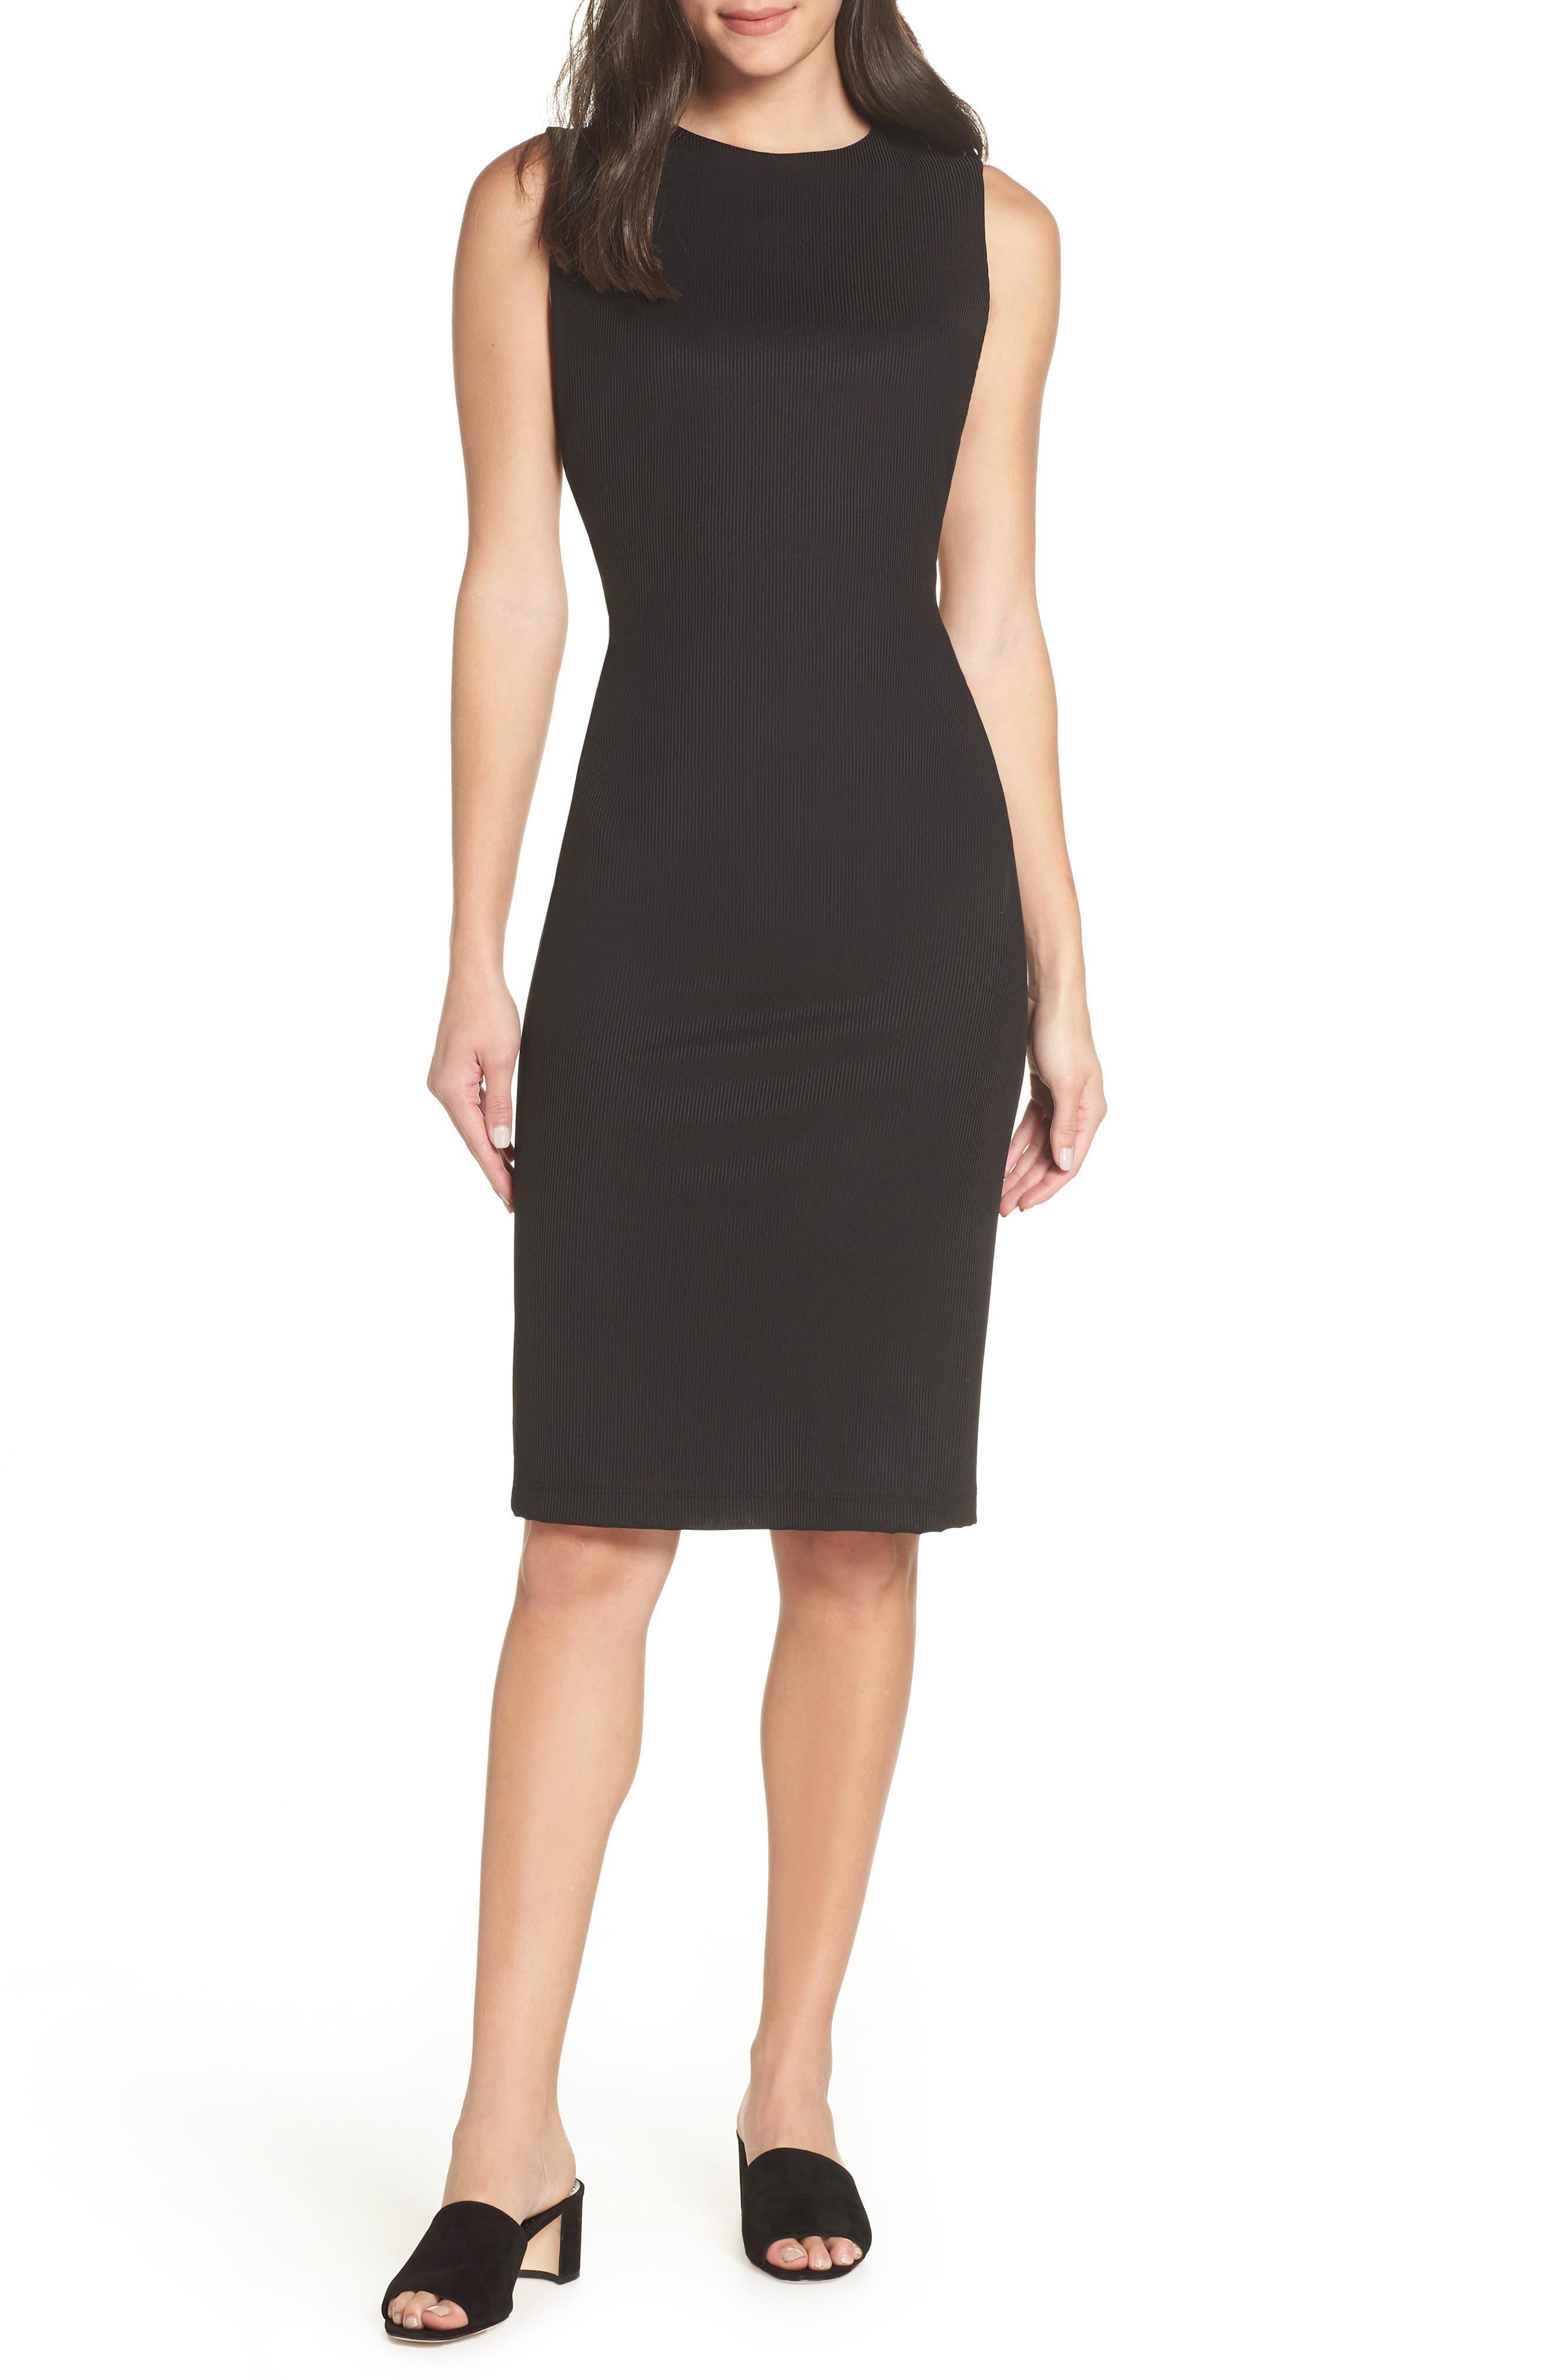 Nsr Olya Rib Sheath Dress, Black